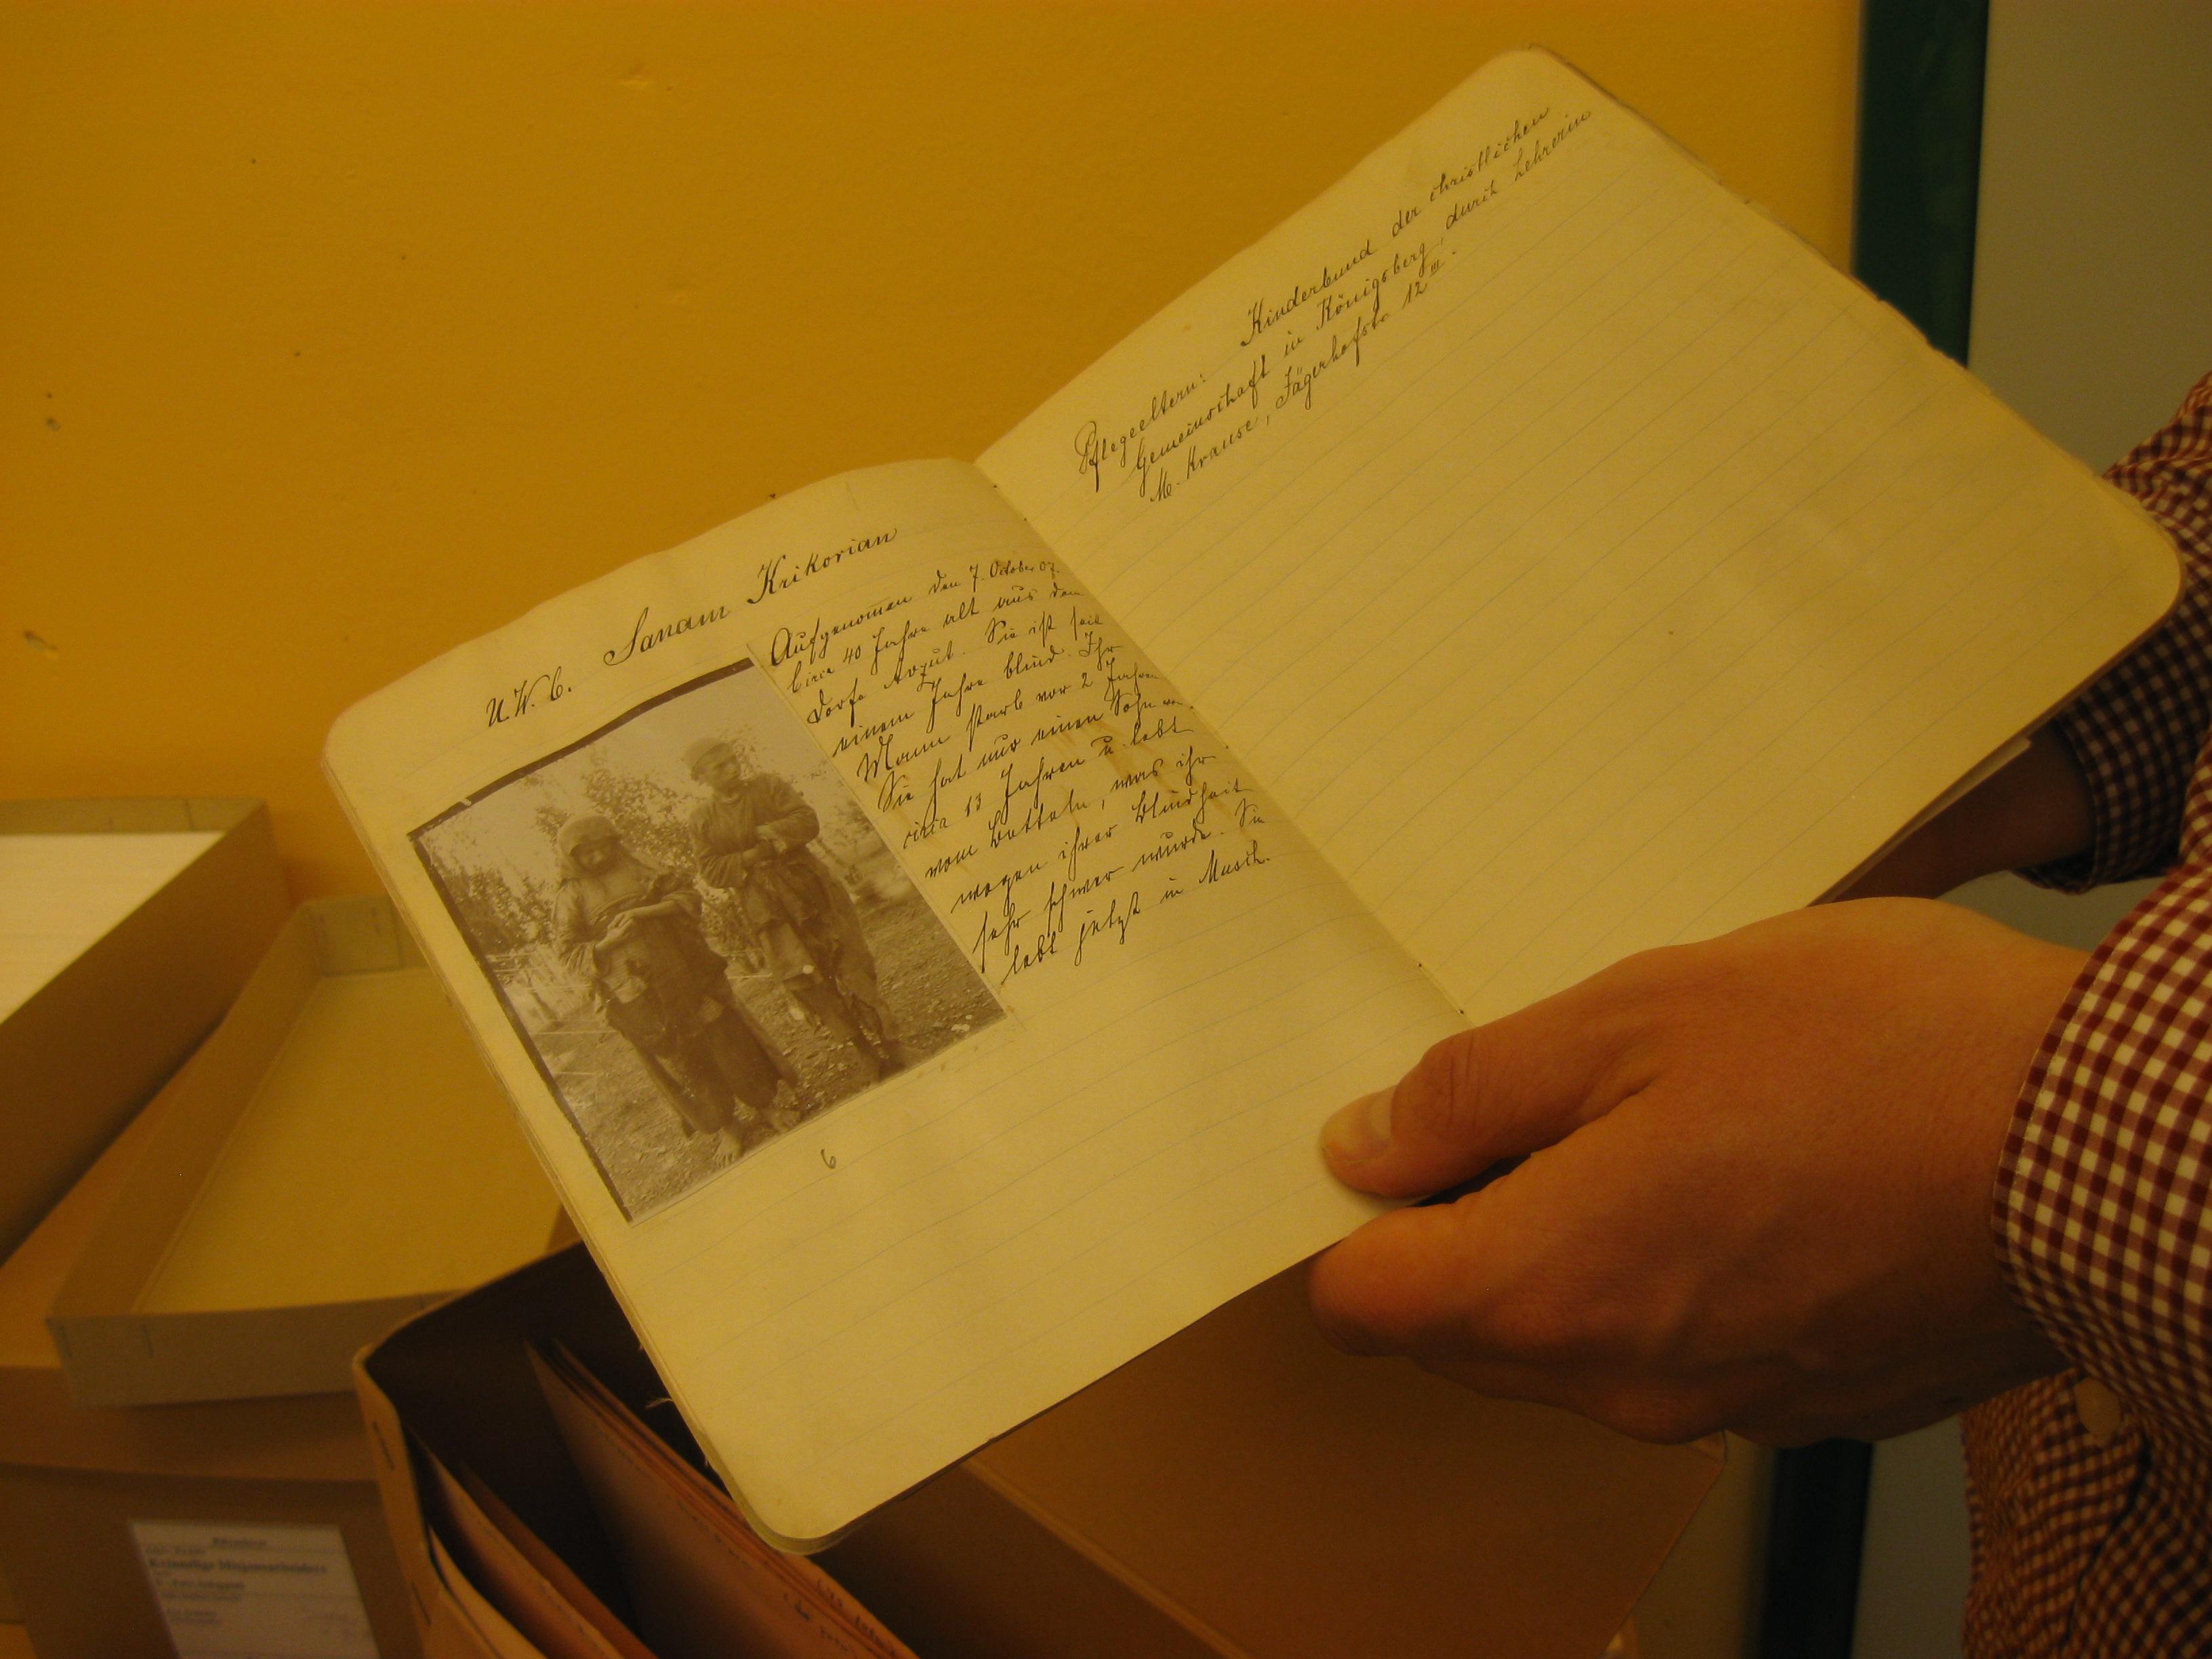 armenian genocide paper